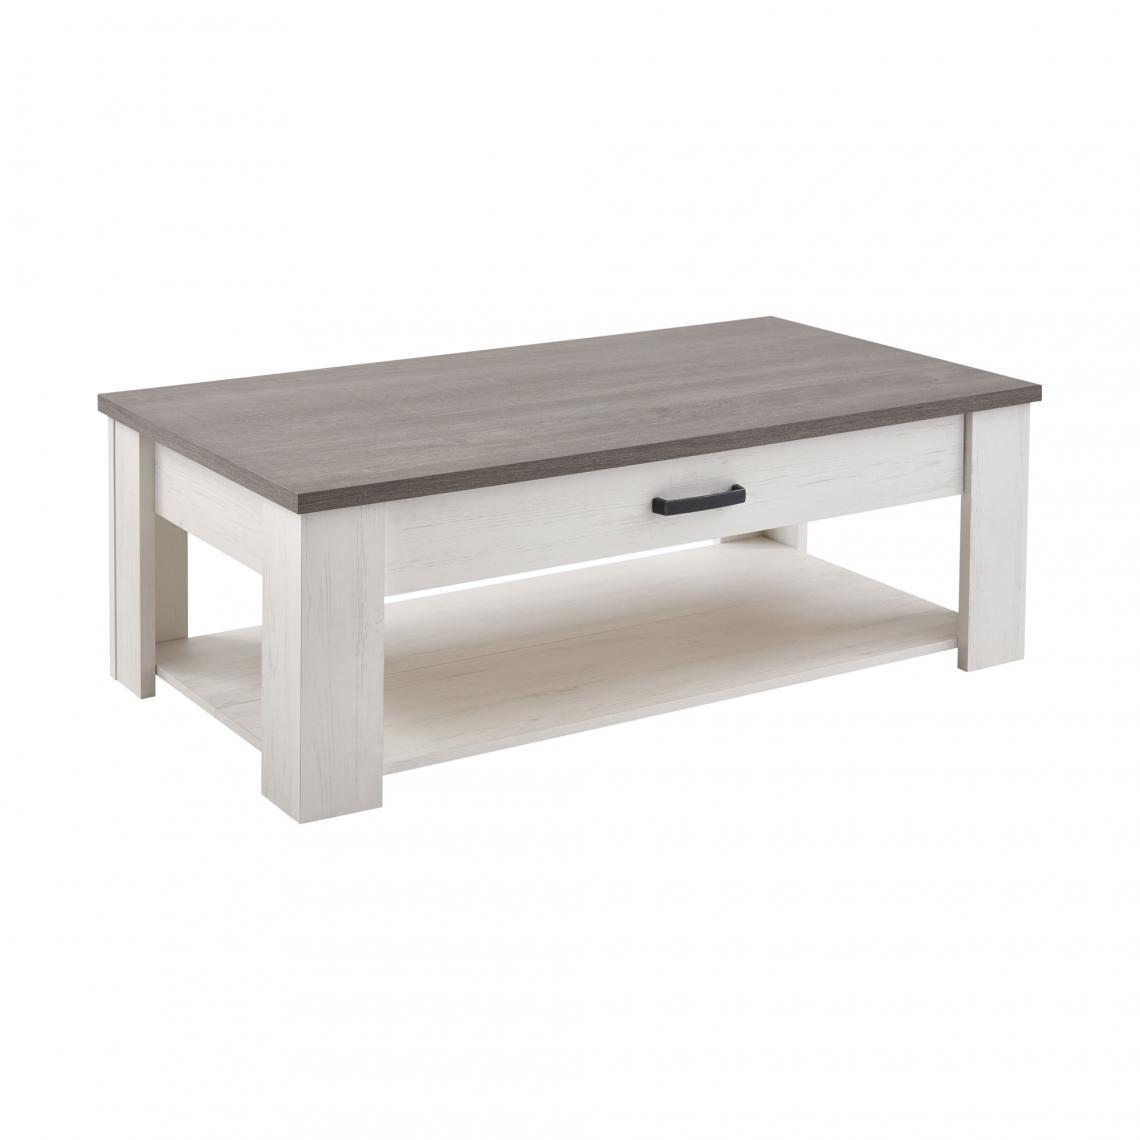 table basse rectangulaire double plateau 1 tiroir marquis. Black Bedroom Furniture Sets. Home Design Ideas